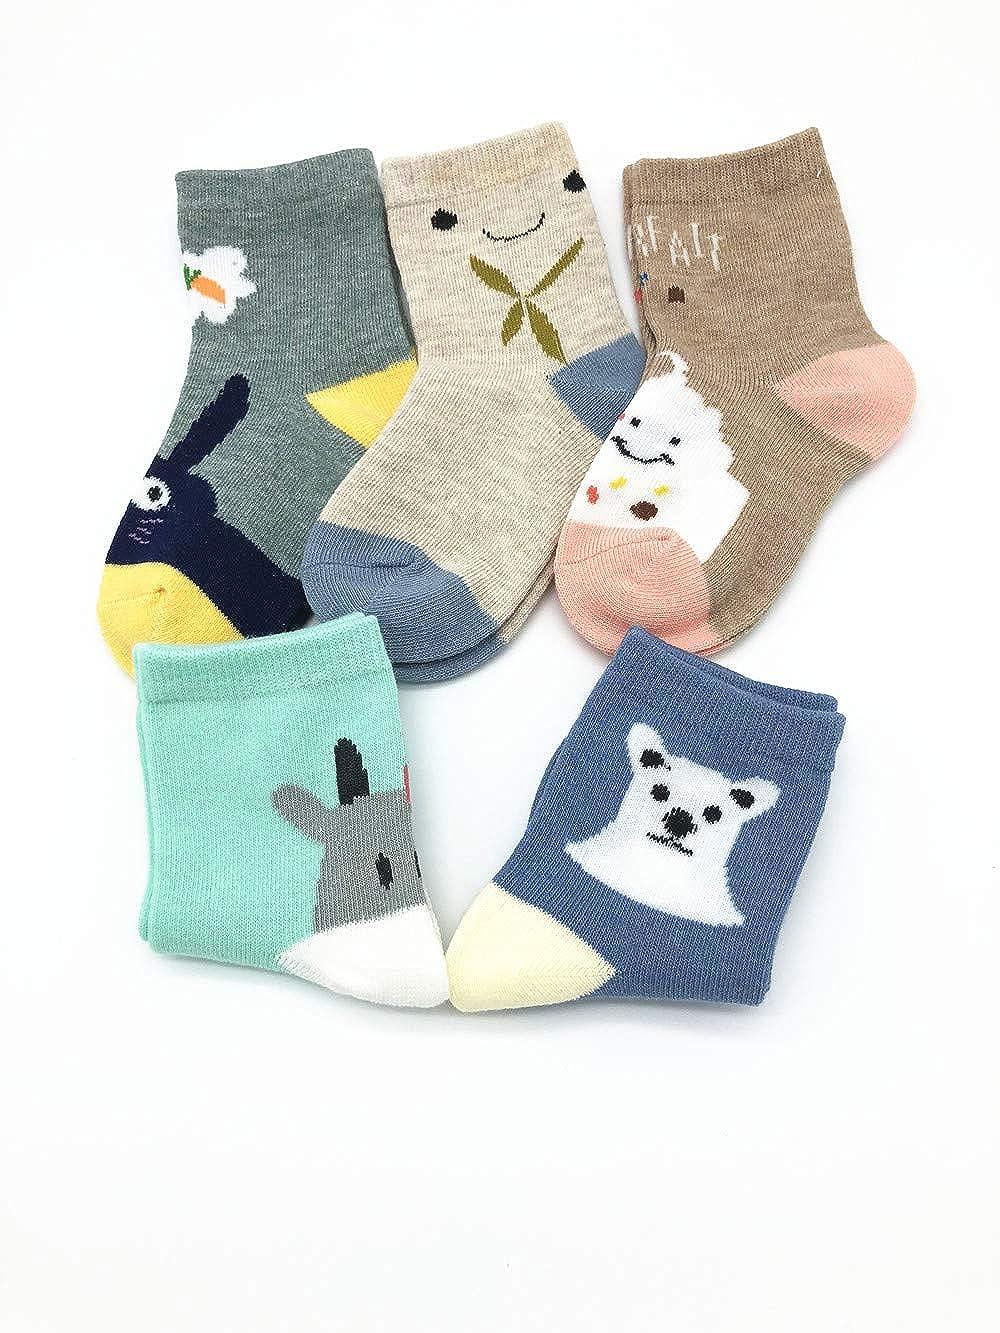 BOMPOW Baby Socks Toddler Kids Floor Socks for 1-3 Years Old Baby